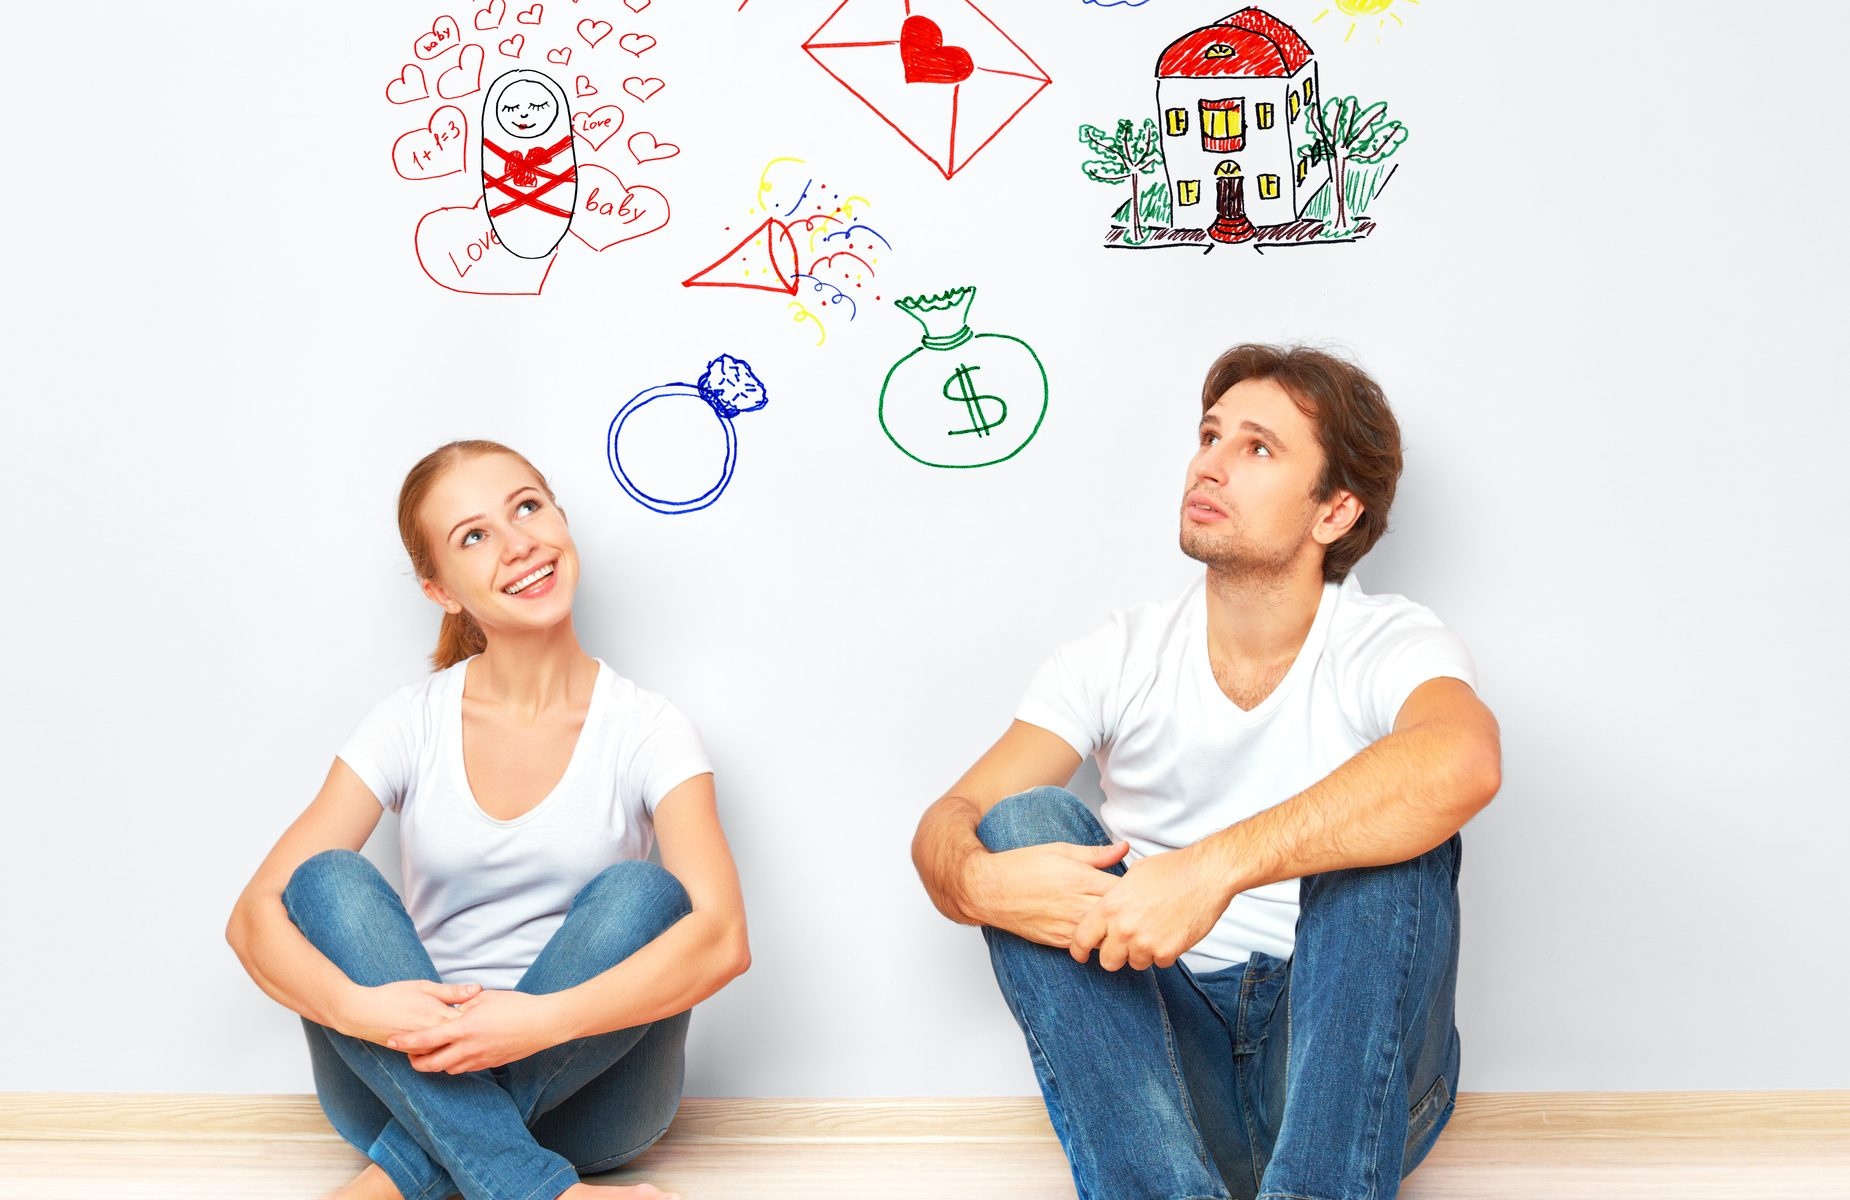 Junges Paar plant die Zukunft